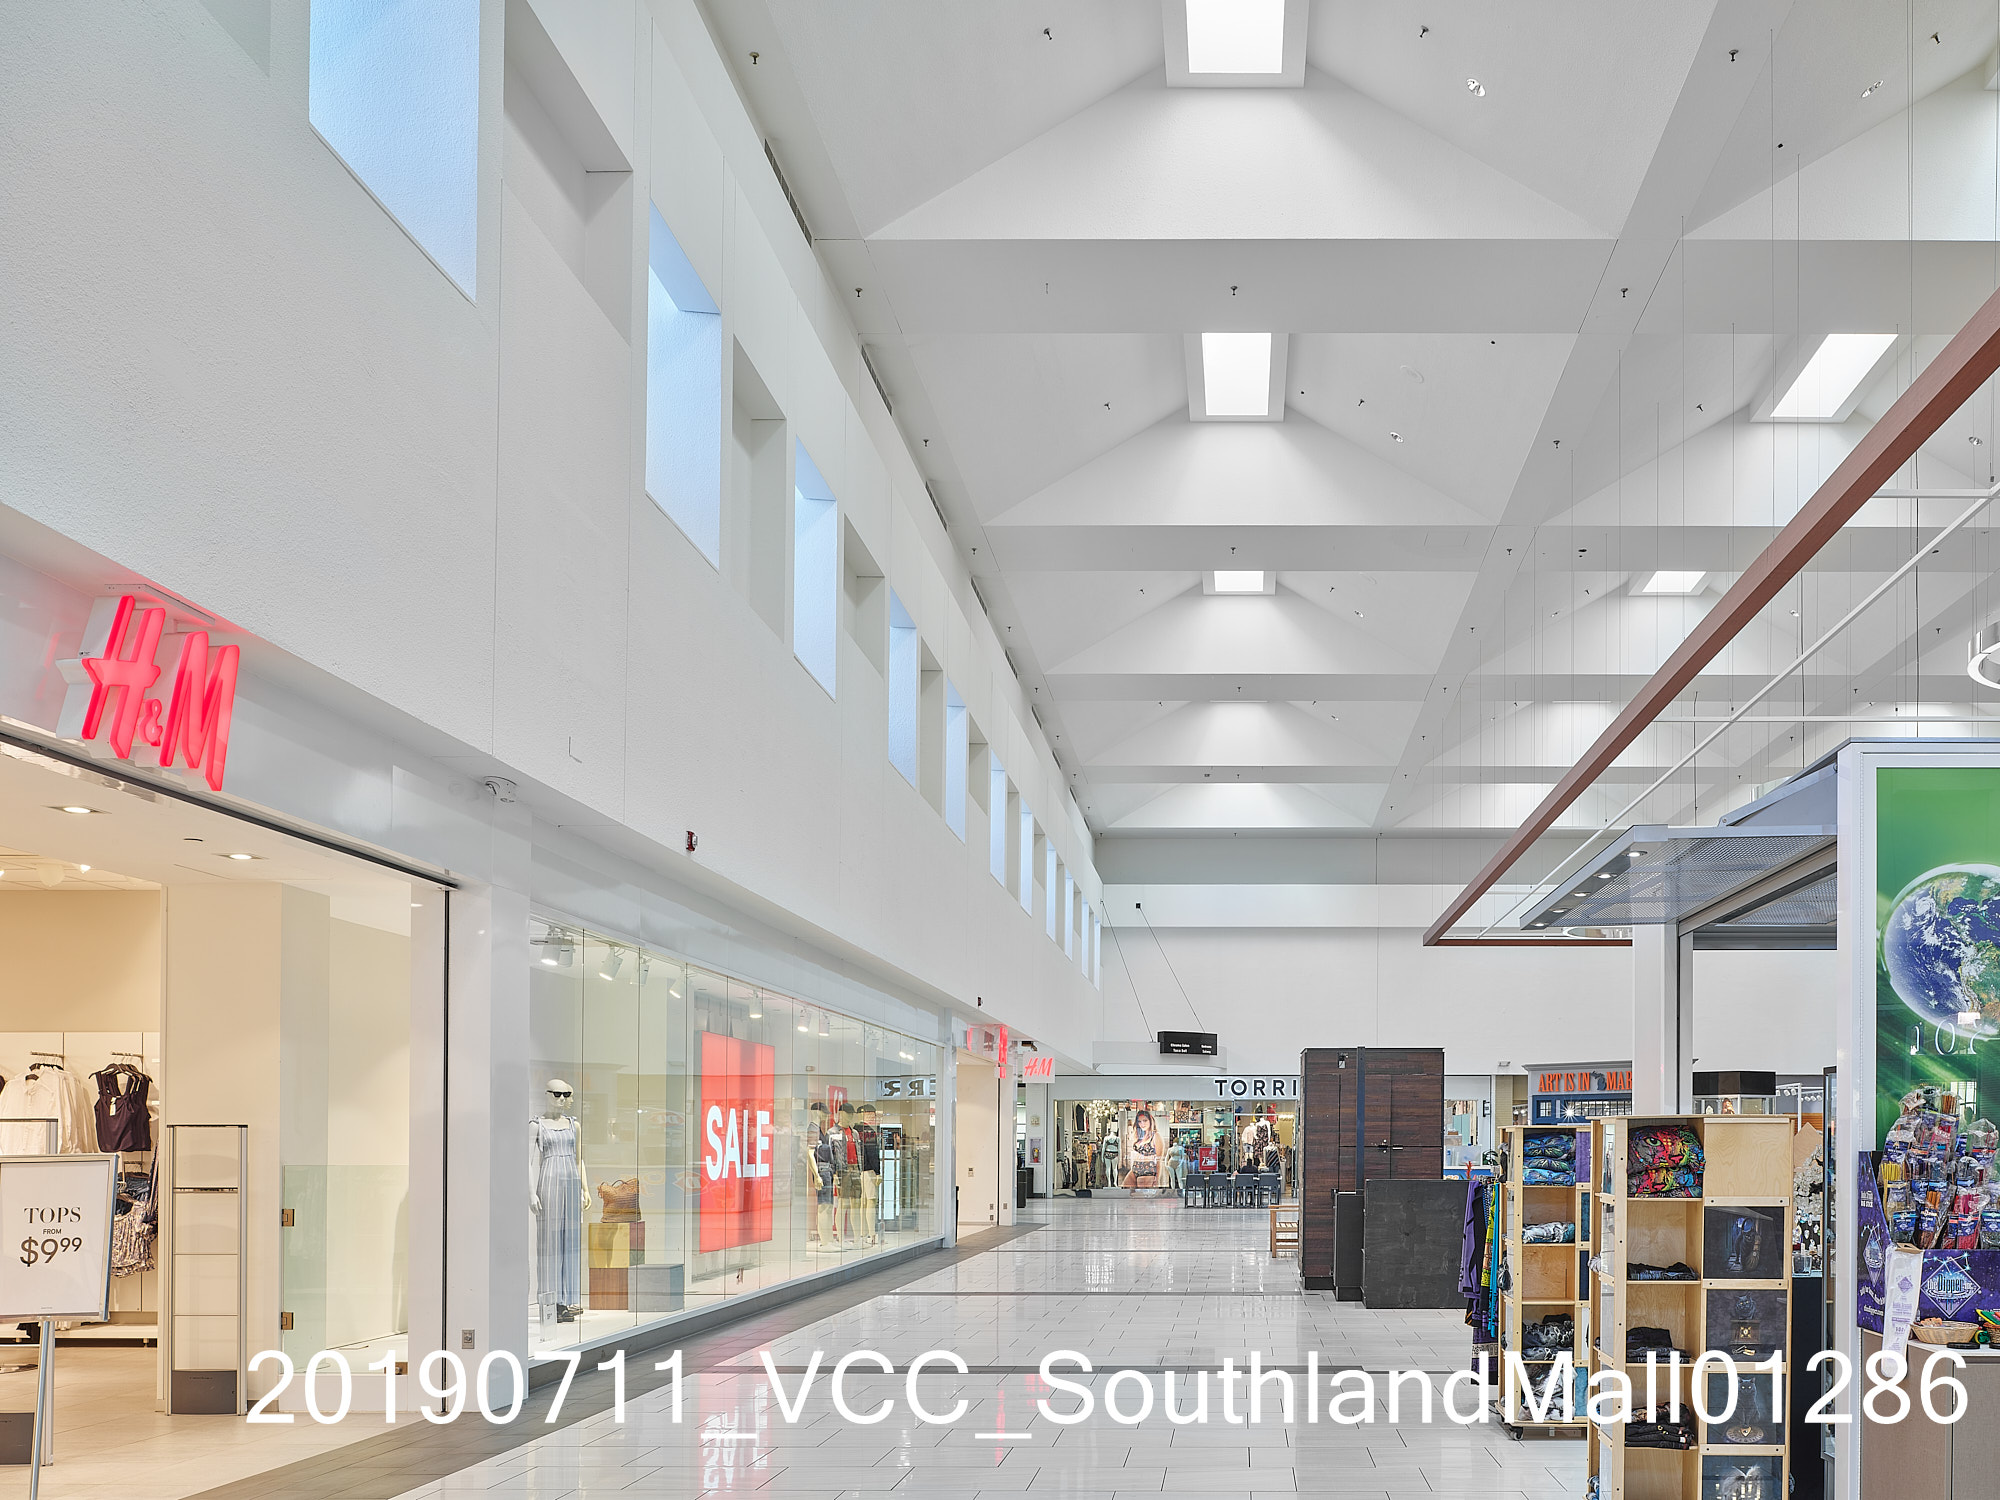 20190711_VCC_SouthlandMall01286.jpg